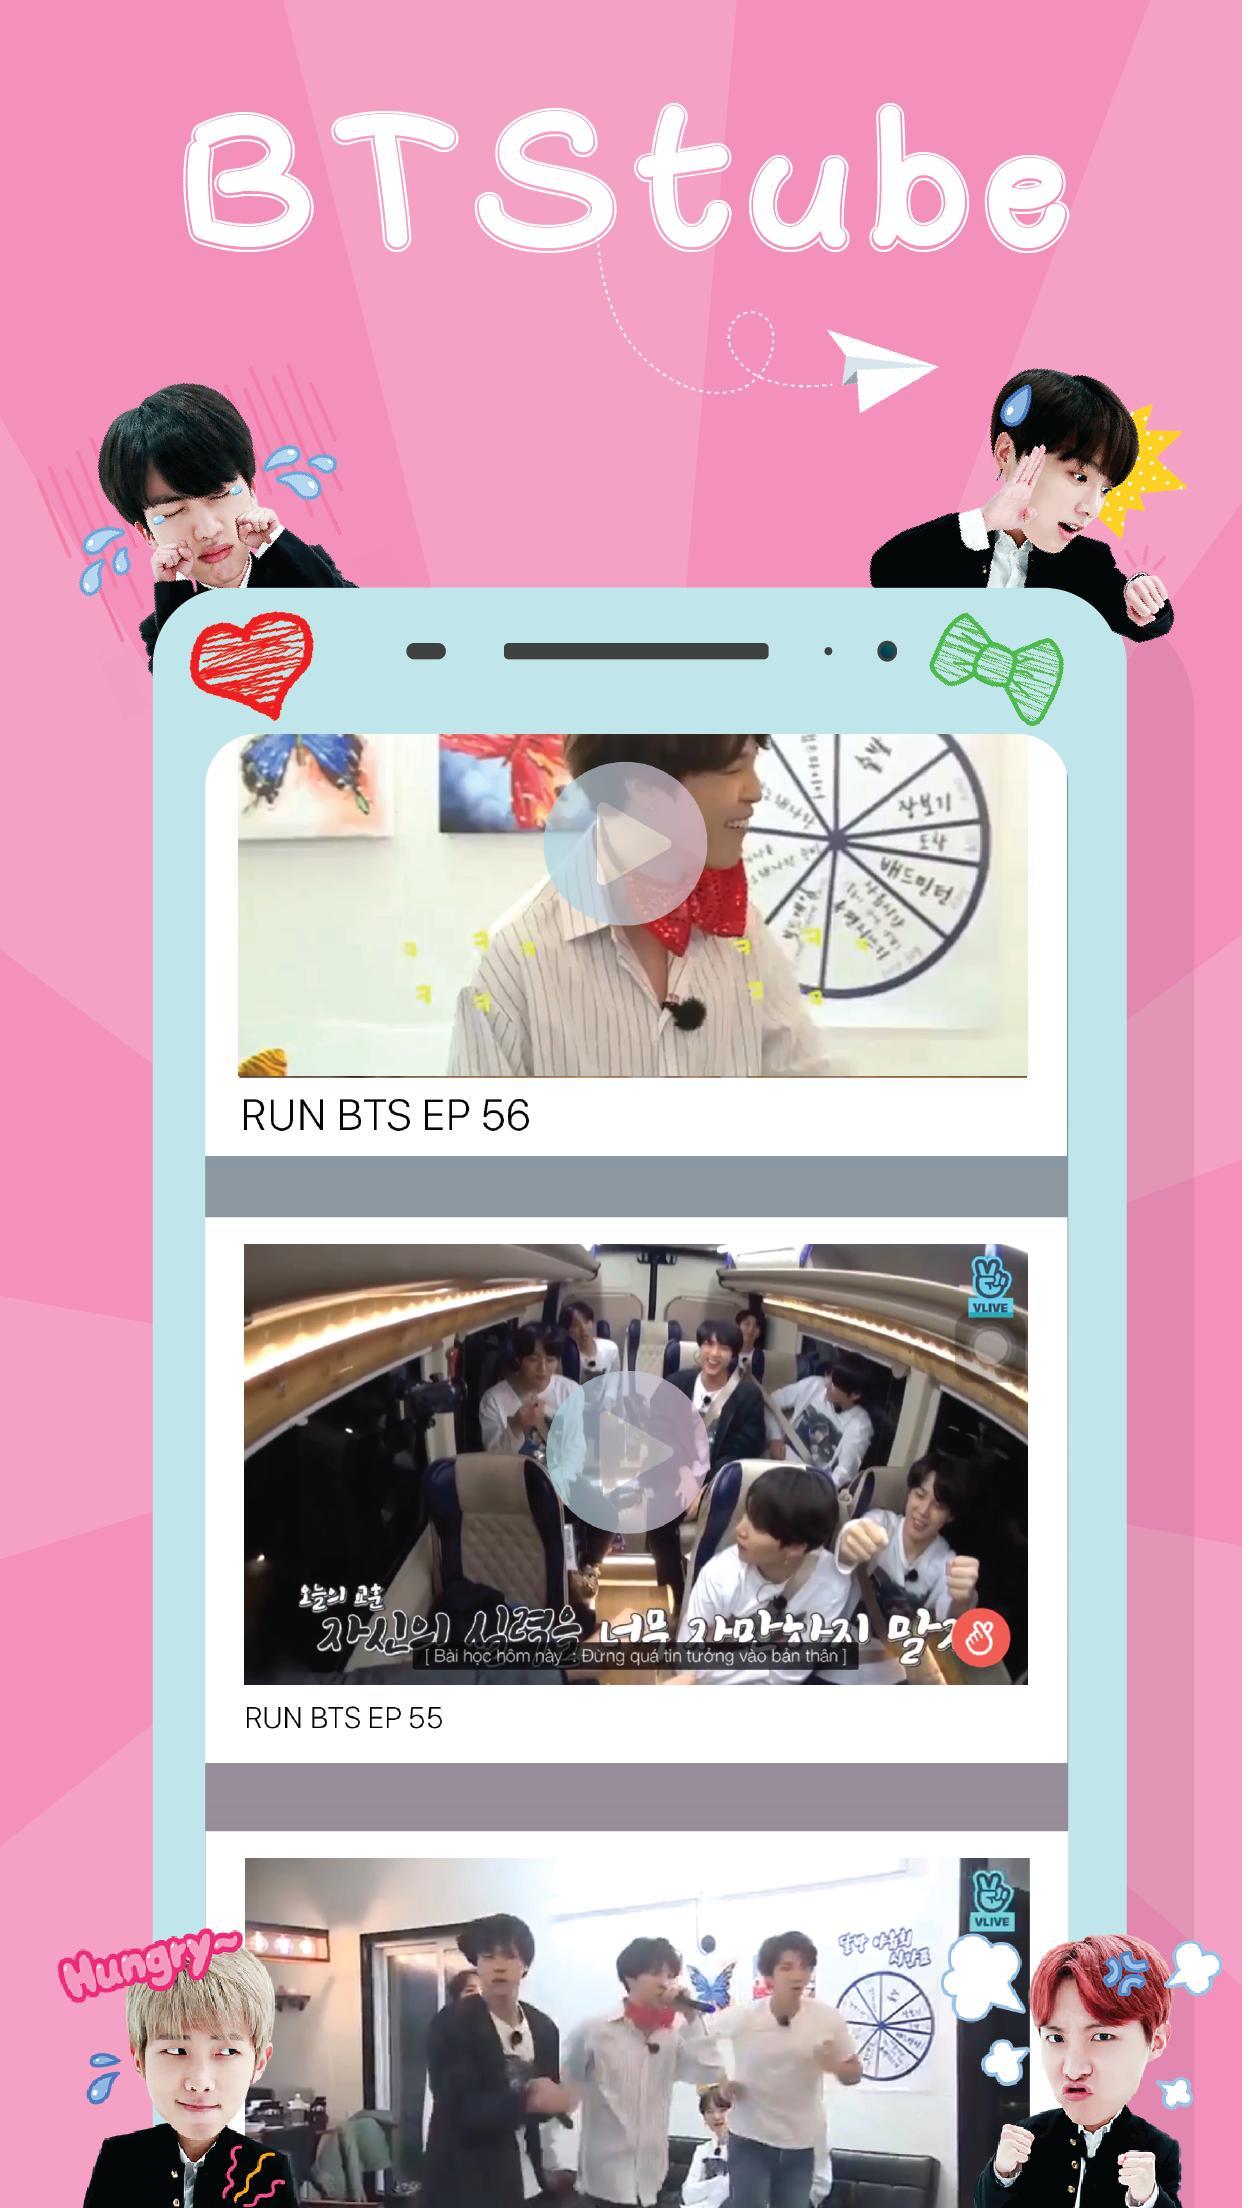 BTStube - BTS Kpop Videos For Fan for Android - APK Download